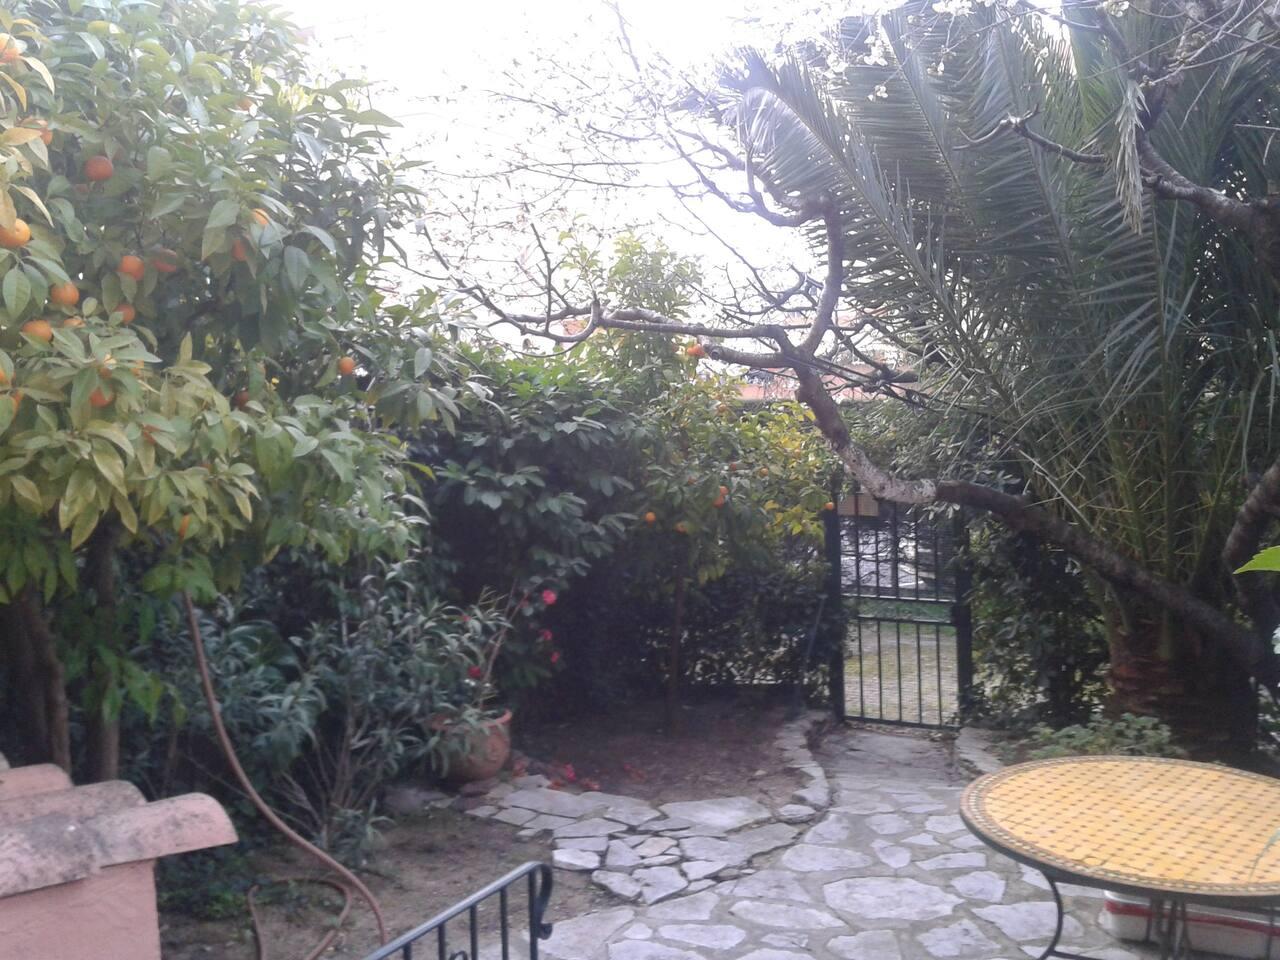 Jardin privatif et arboré. Table et salon de jardin